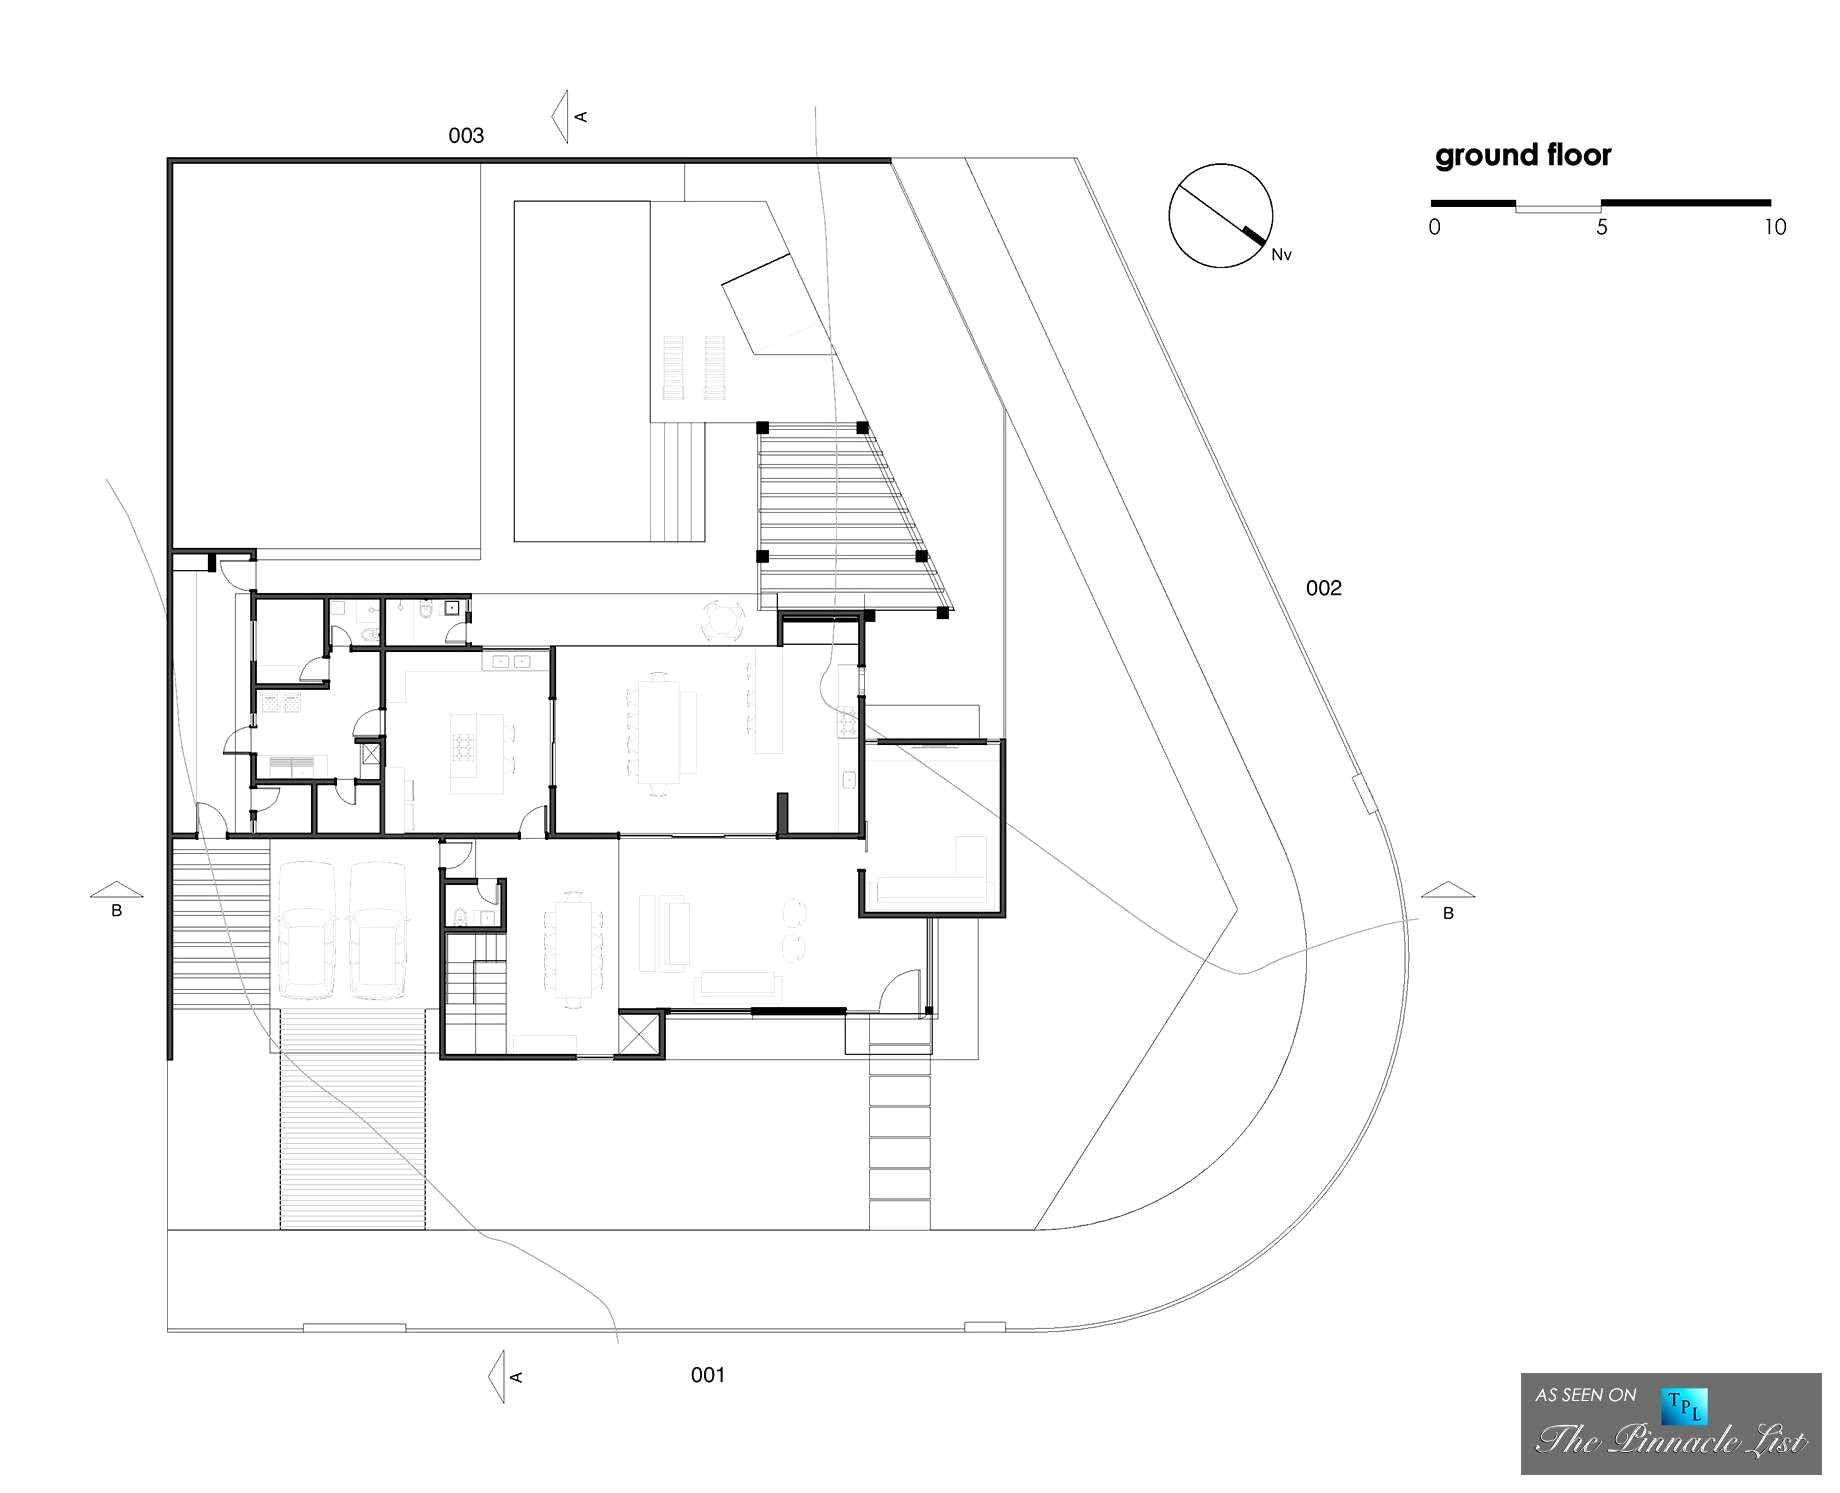 tony stark home floor plan